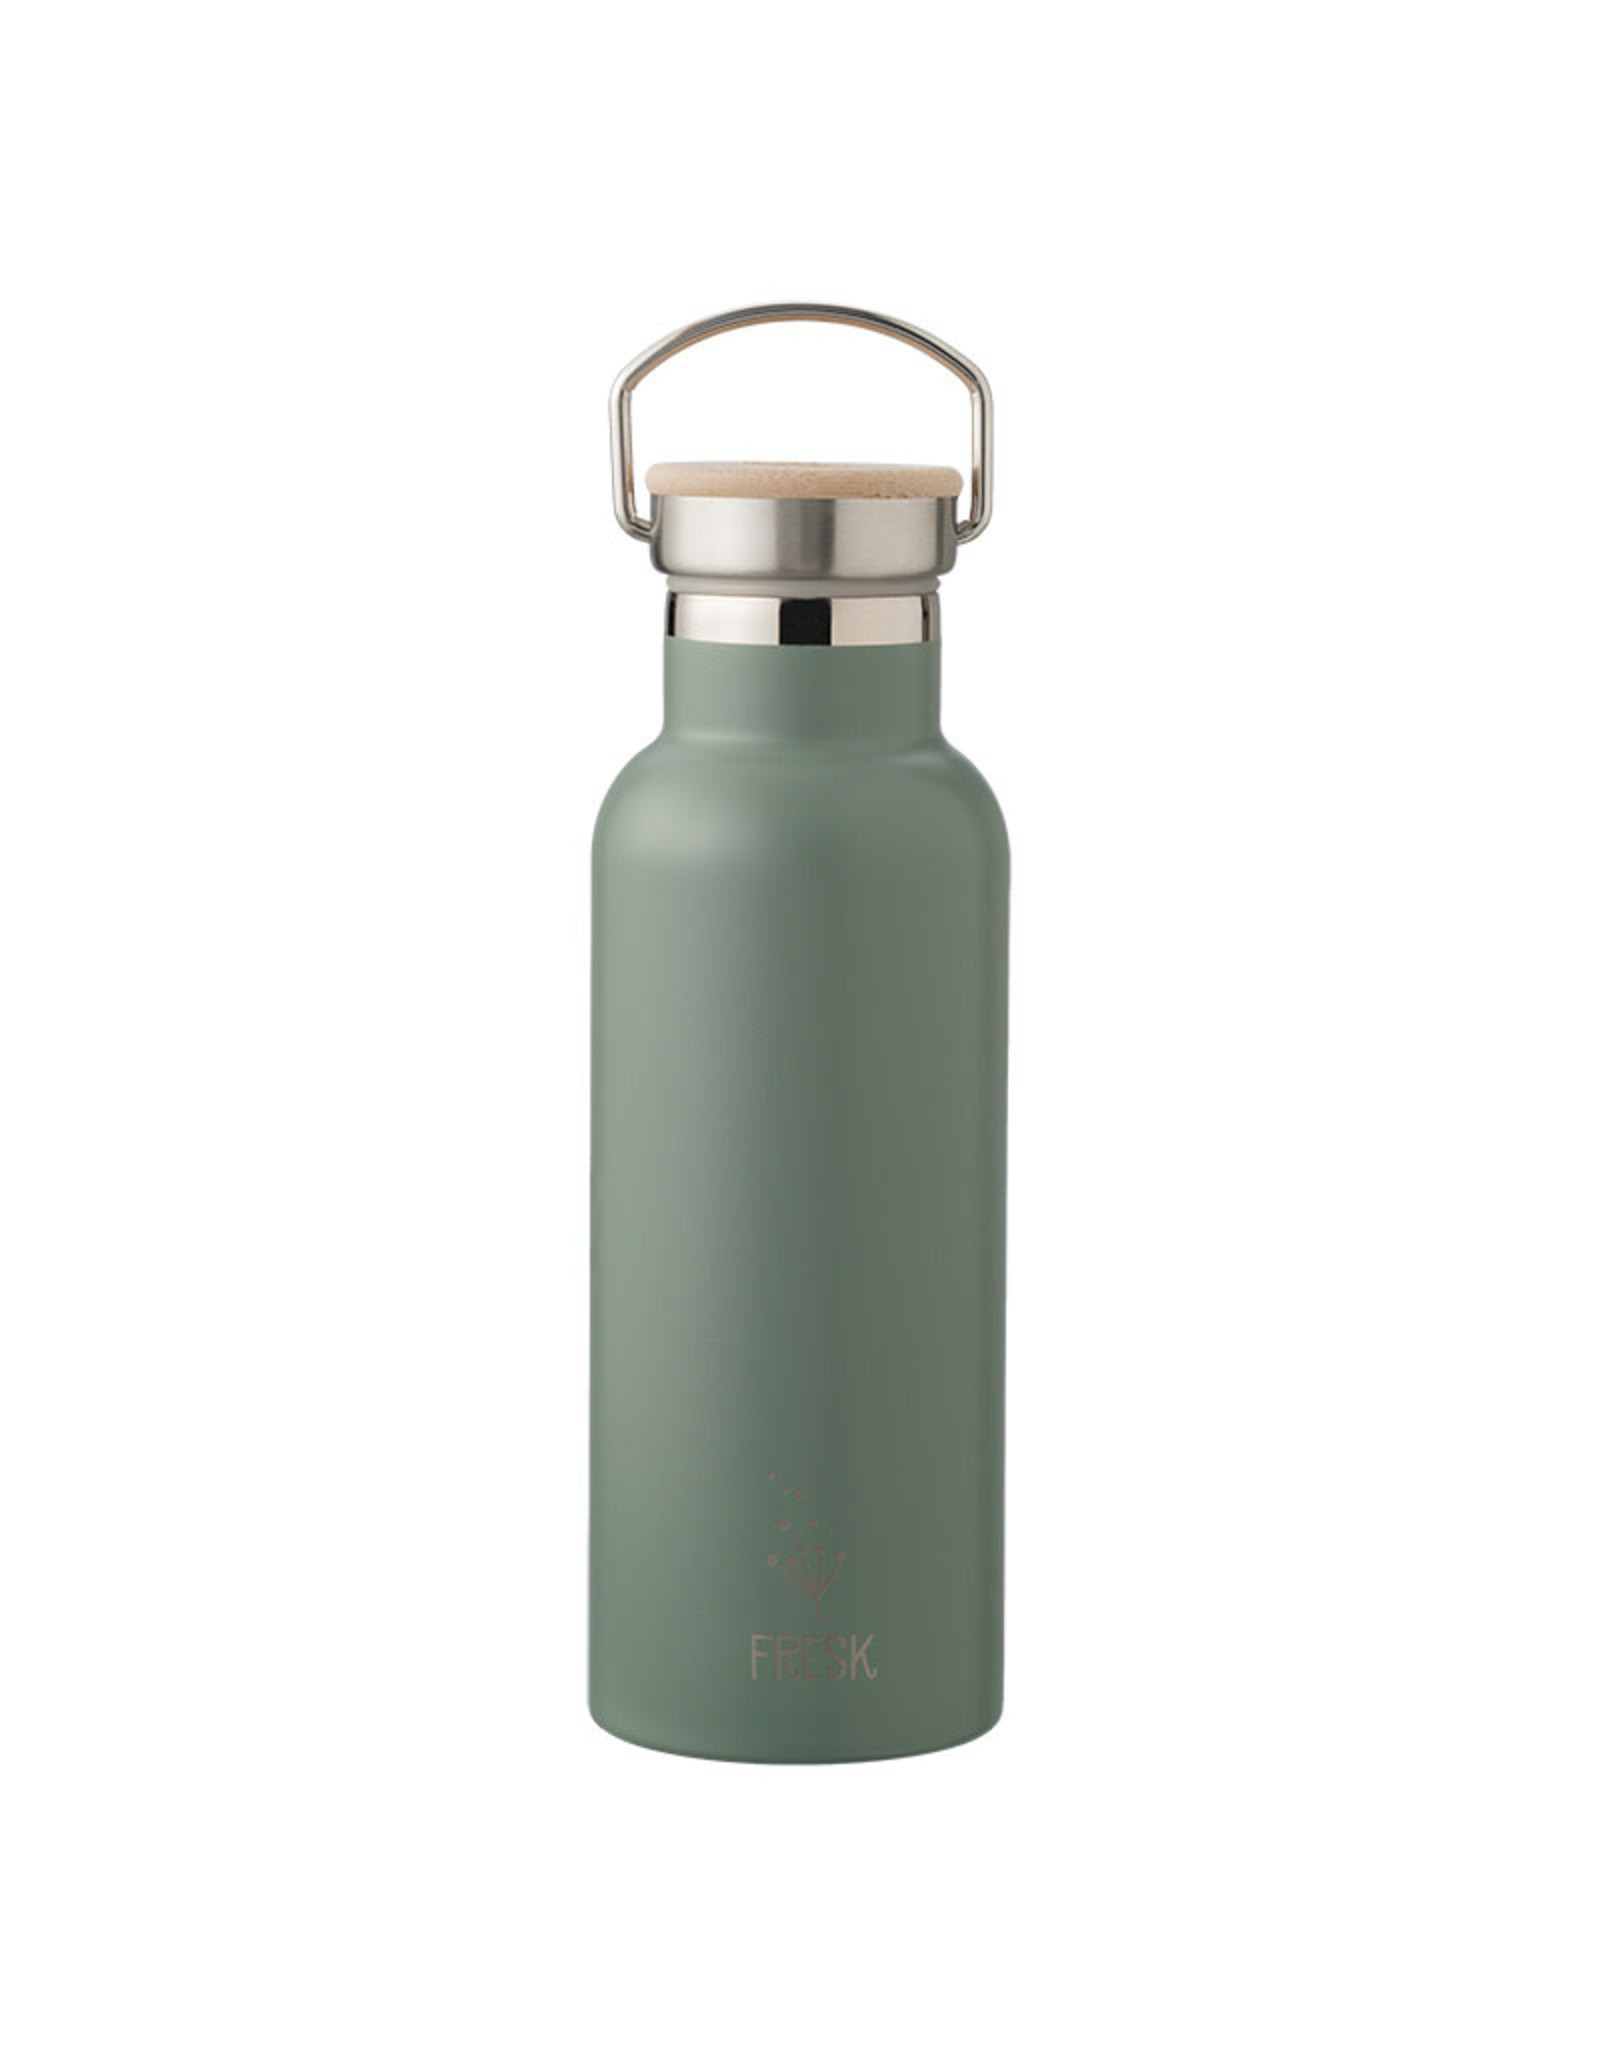 FRESK thermos bottle 500ml chinois green